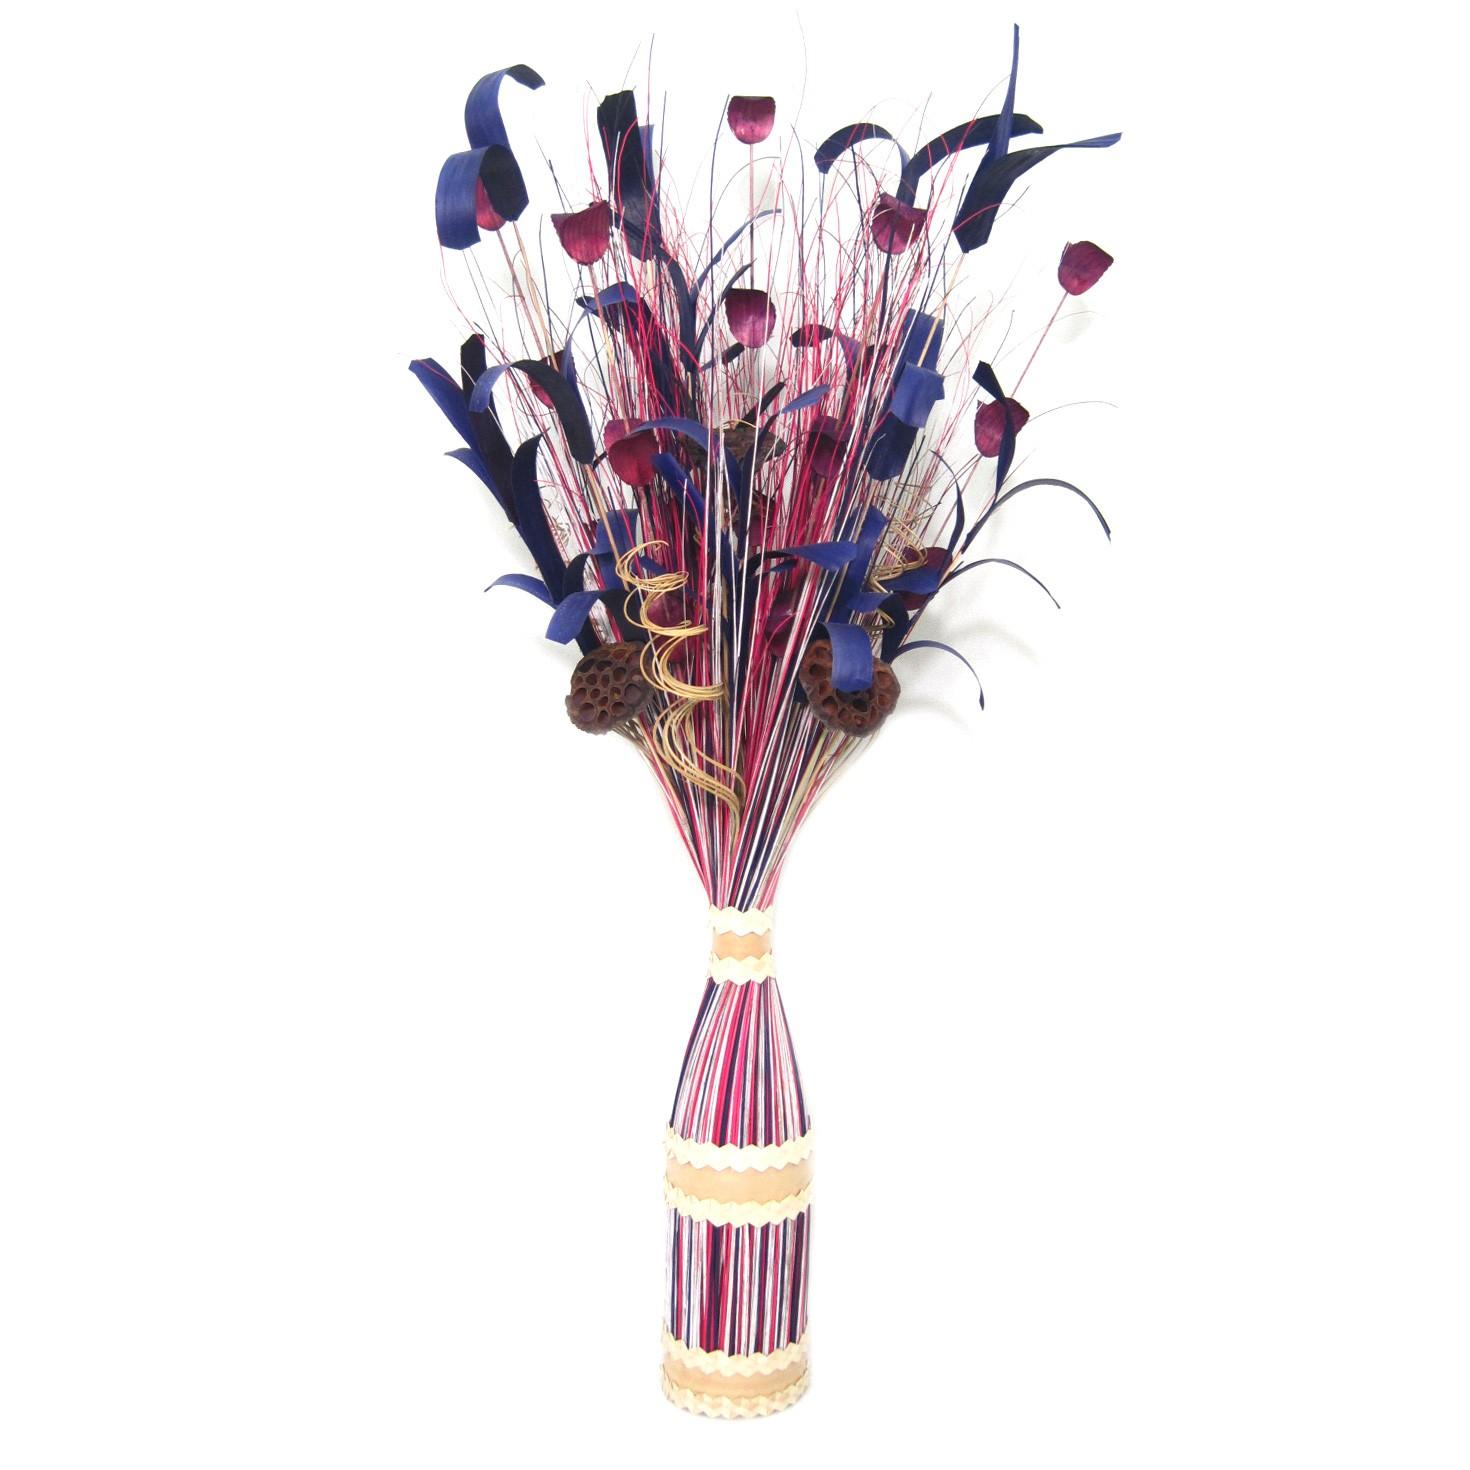 Flori uscate, 116 AR 36025, 100 cm, roz + alb + mov